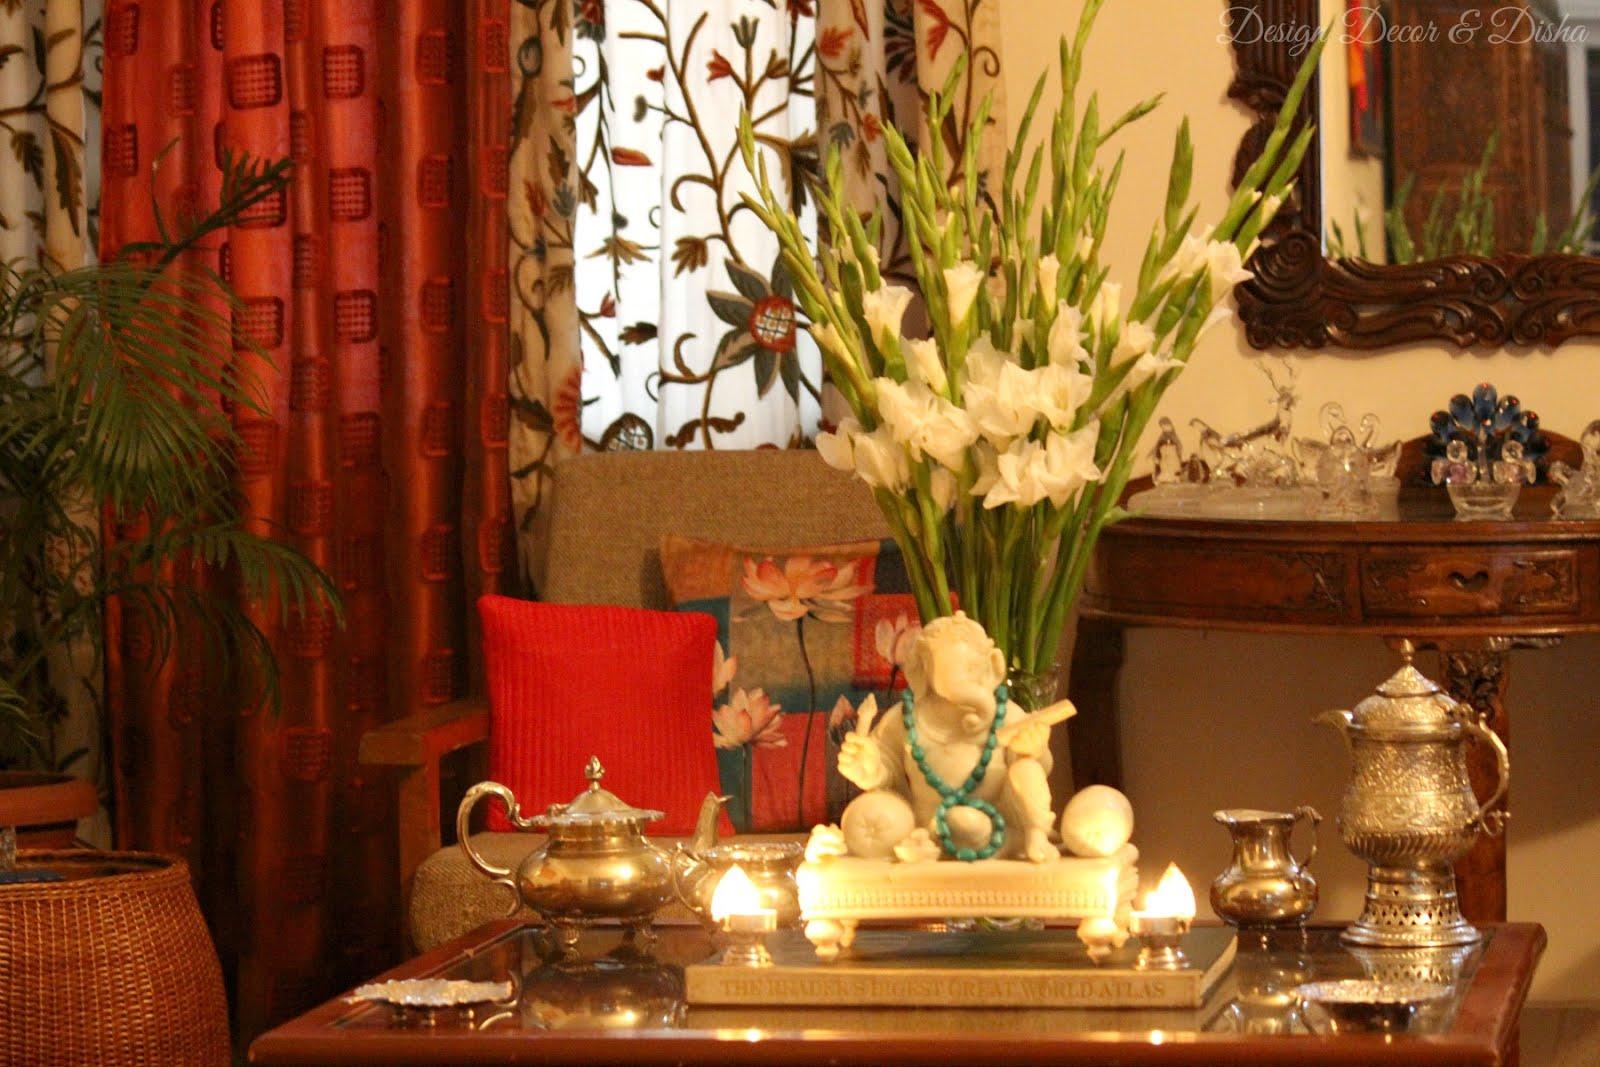 Design Decor Disha An Indian Design Decor Blog Home Home Decorators Catalog Best Ideas of Home Decor and Design [homedecoratorscatalog.us]